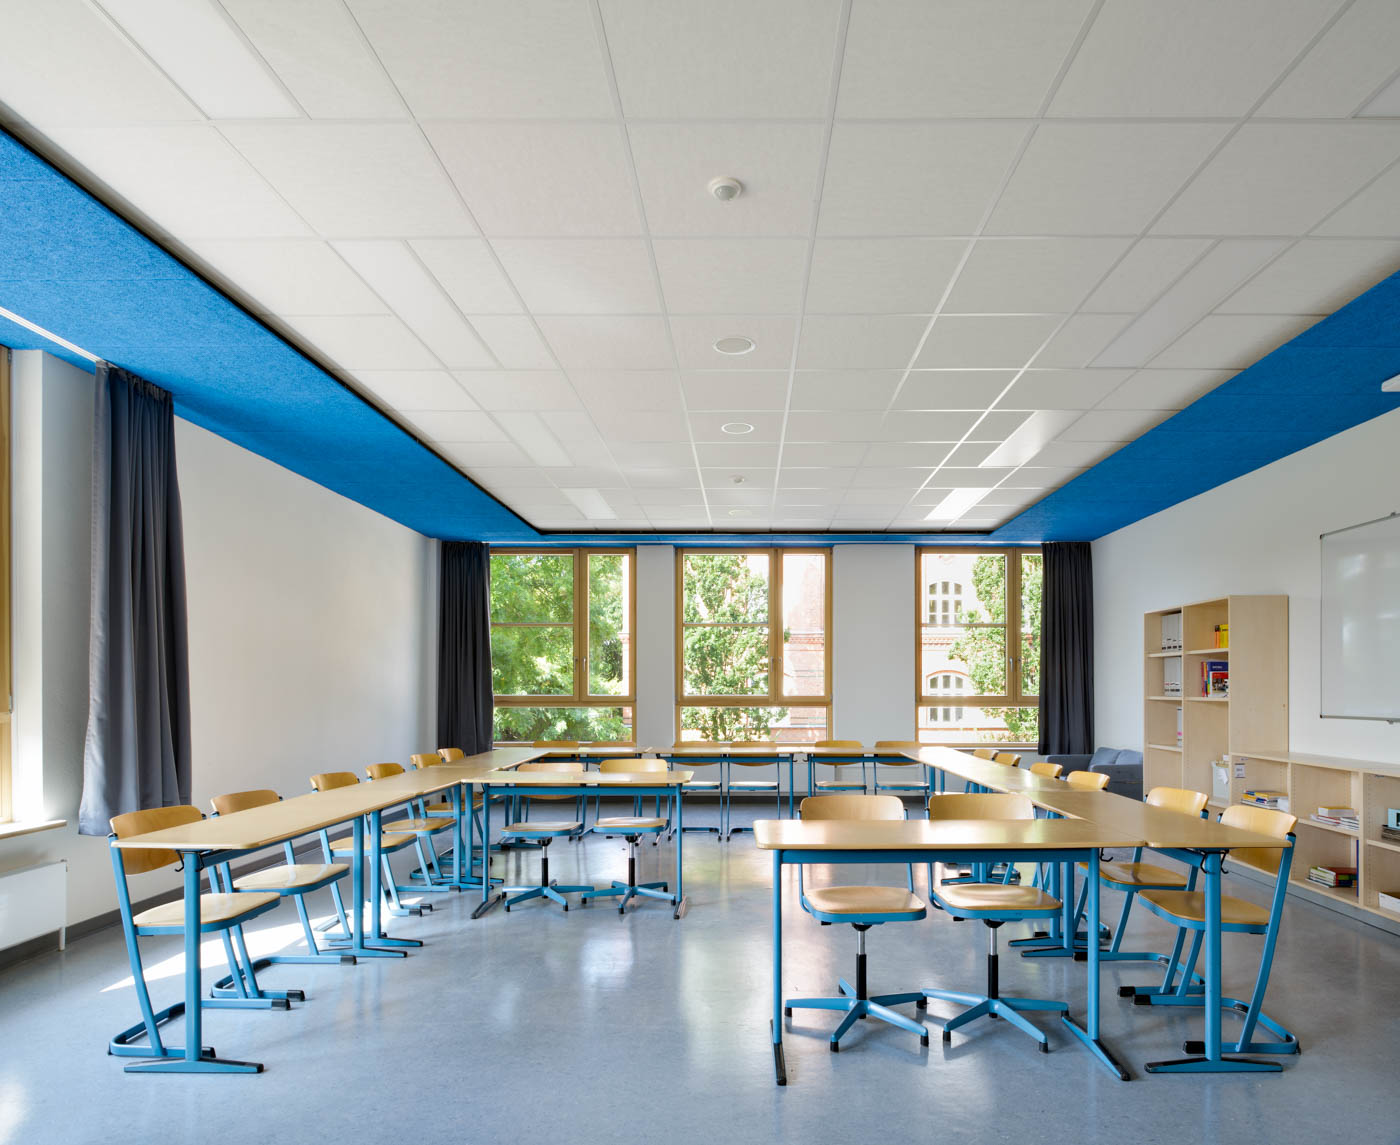 Heinrich-Hertz-Schule Klassenzimmer